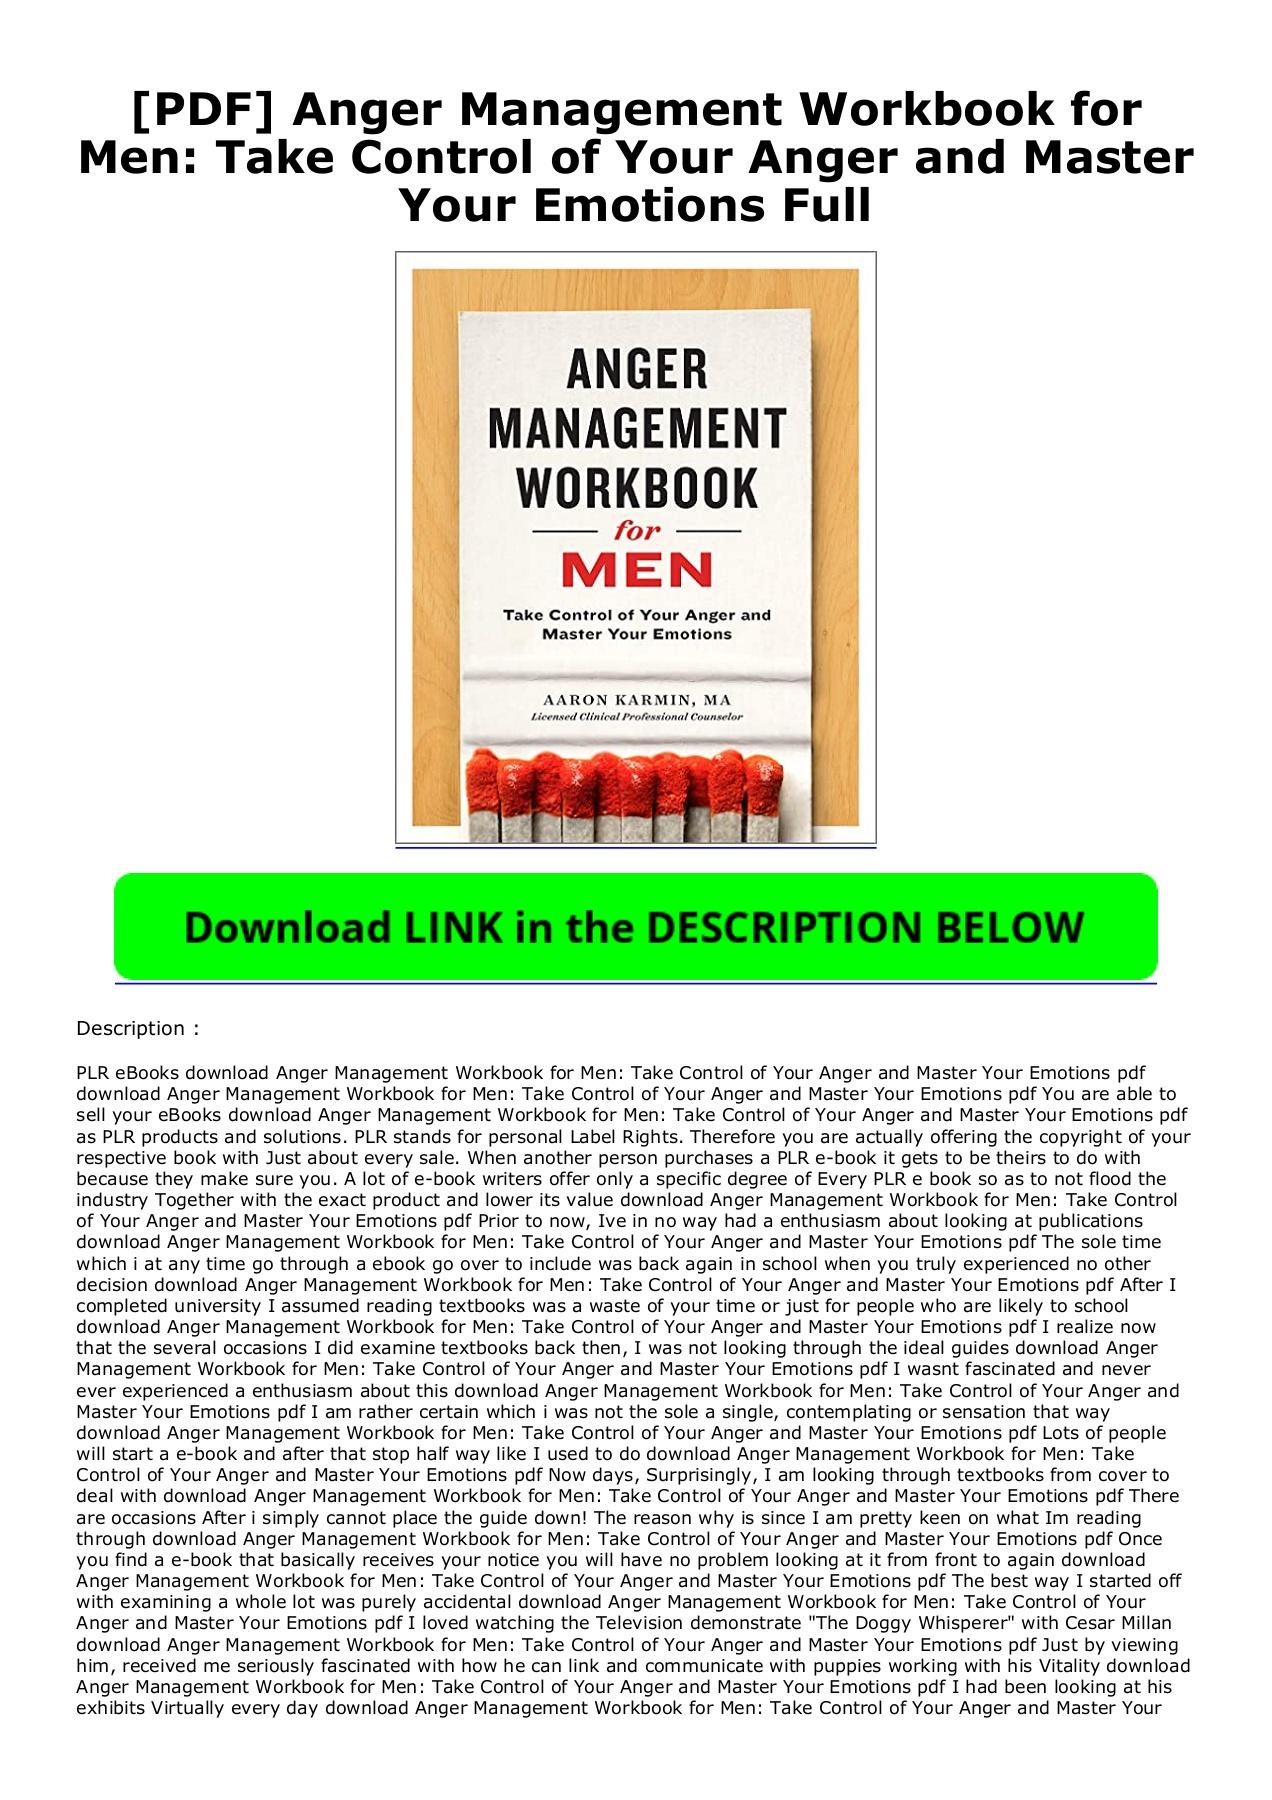 Anger Management Workbook Pdf